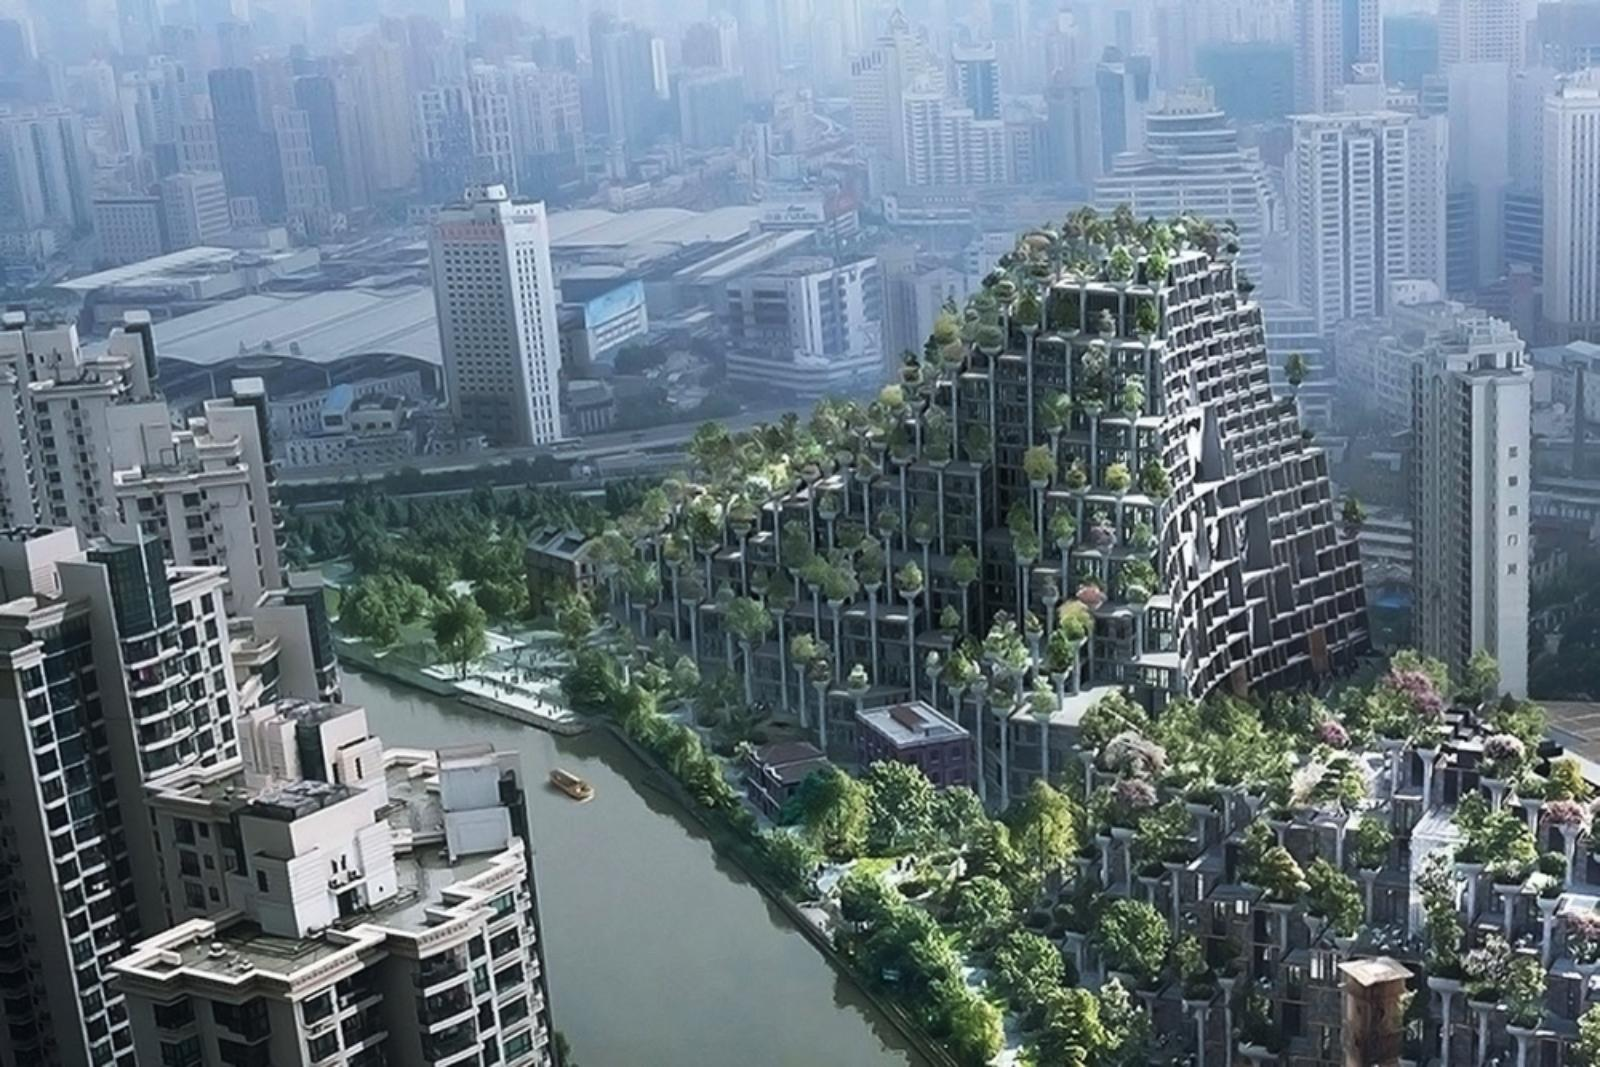 Interior Column Designs Moganshan China By Heatherwick Studio 02 A As Architecture